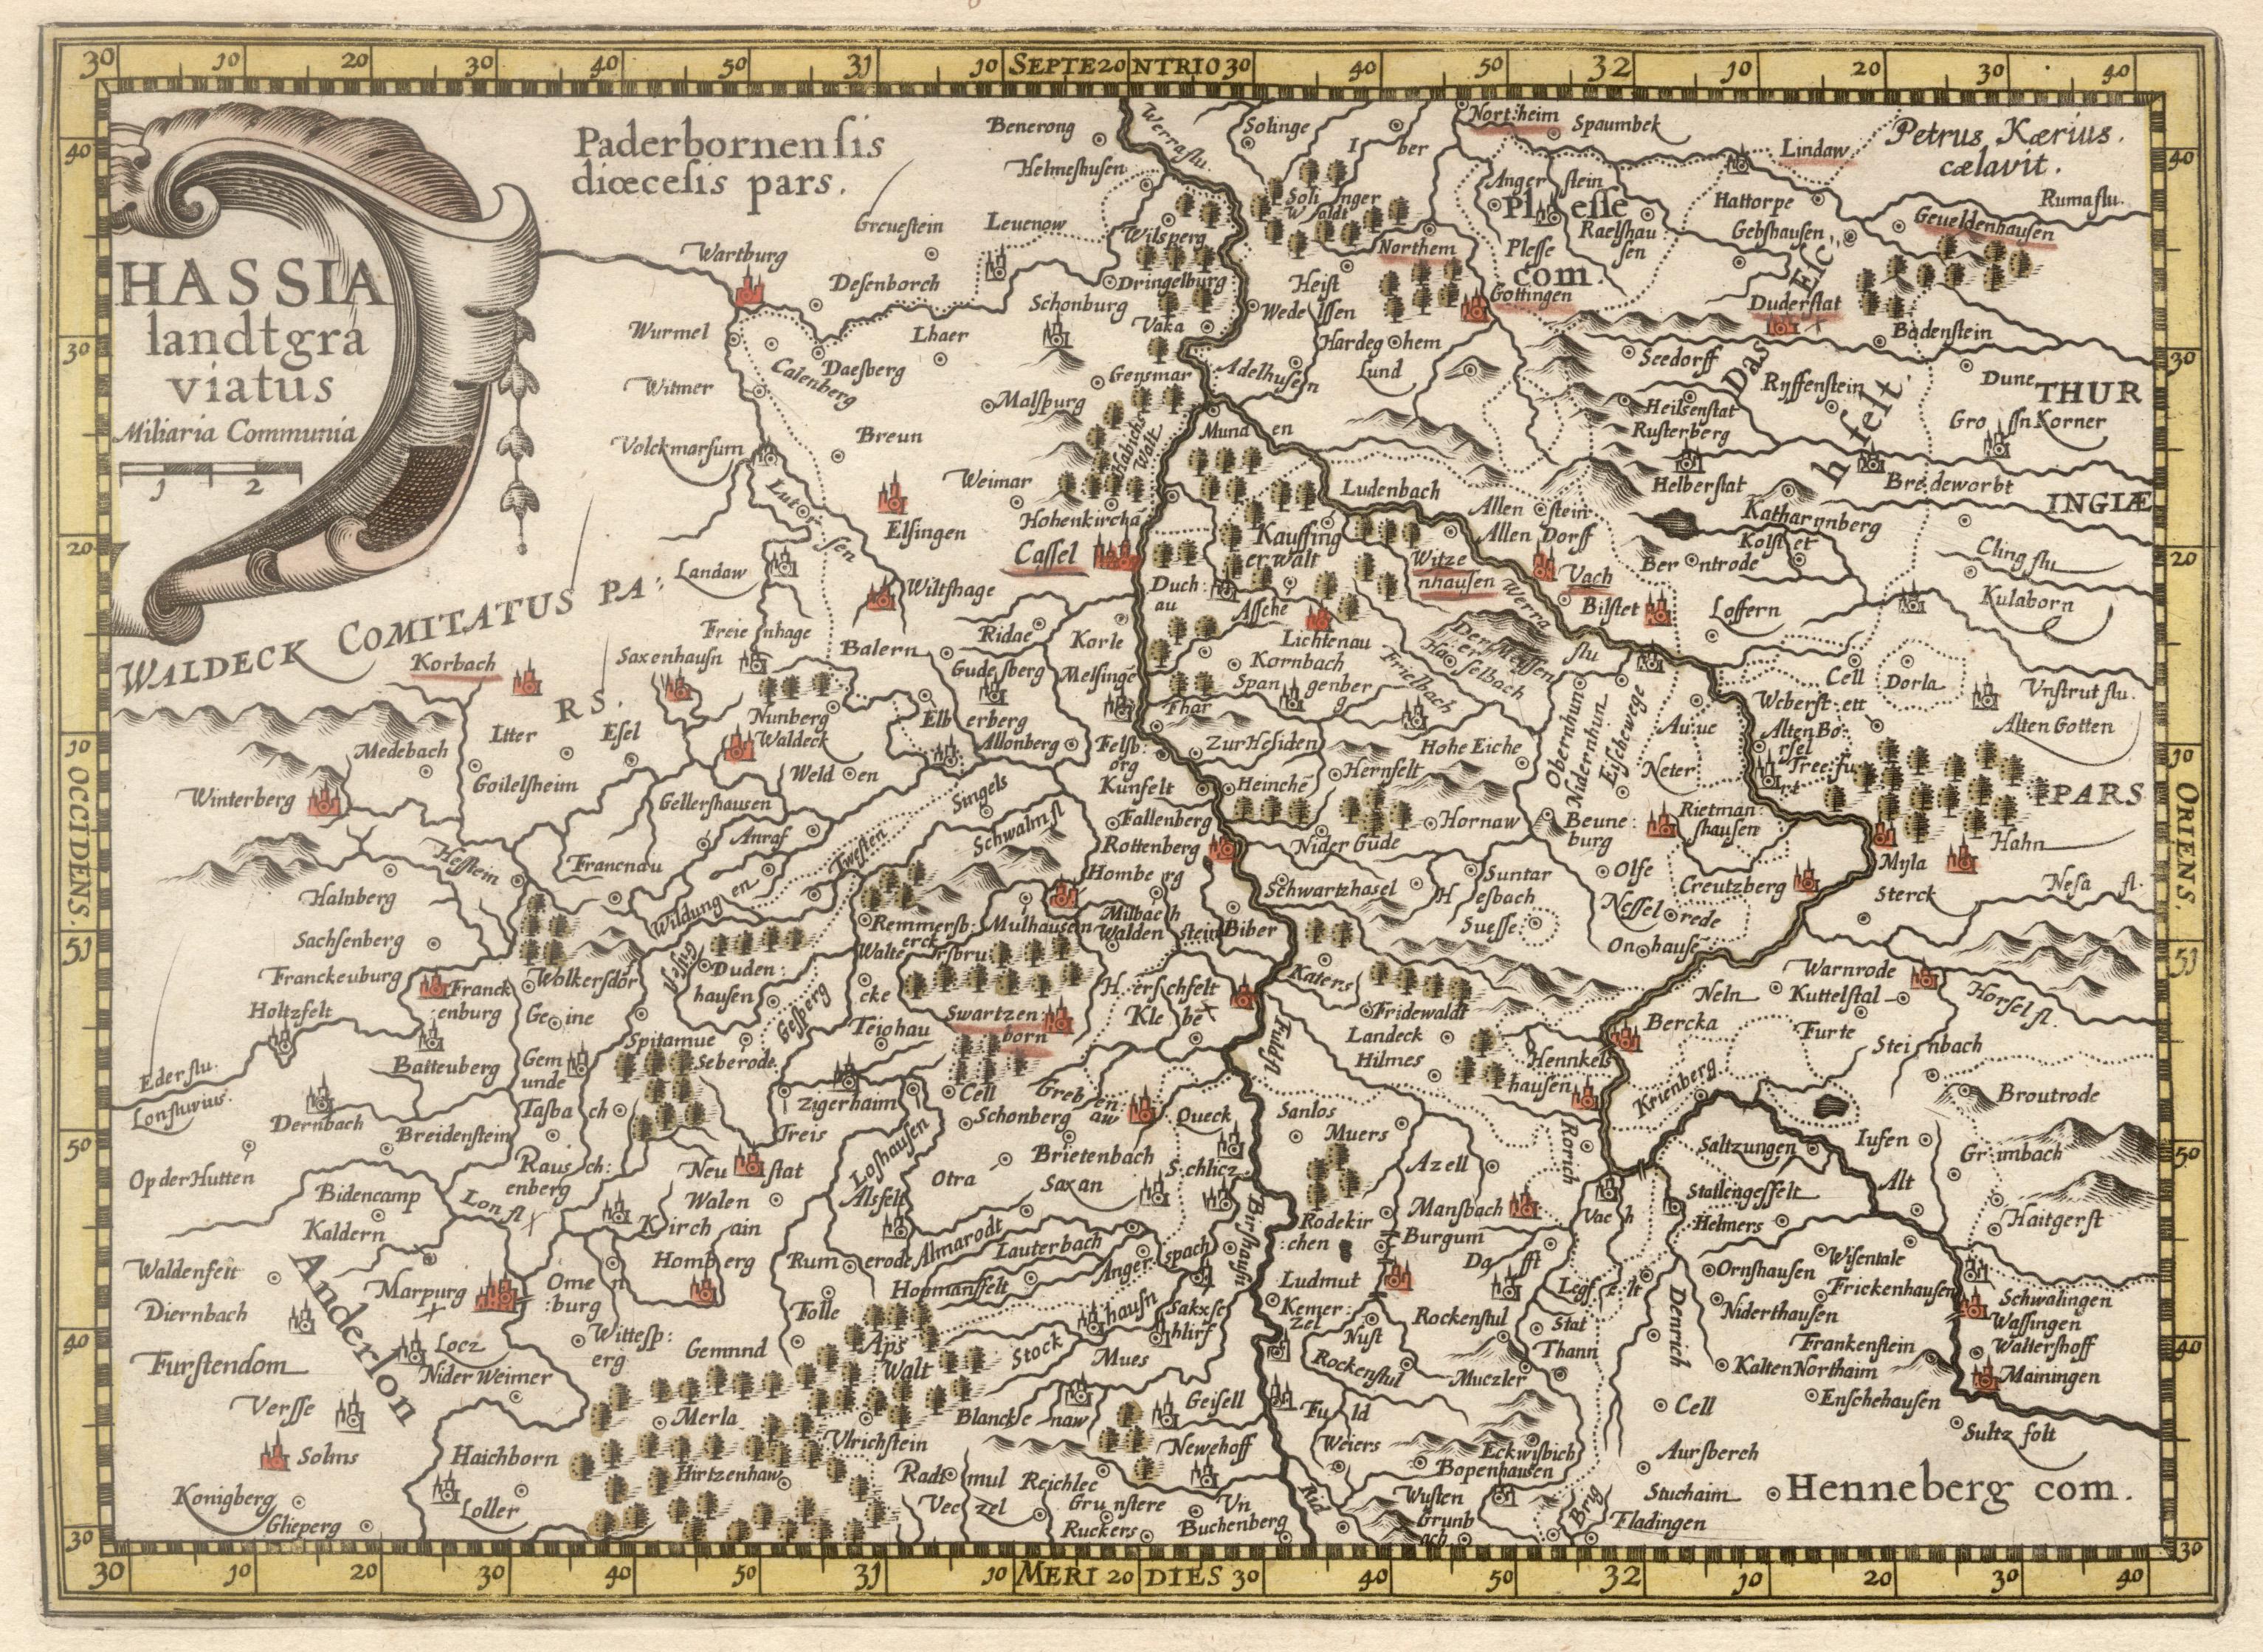 Kst.- Karte, n. P. Kaerius b. Janssonius: Nordhessen: